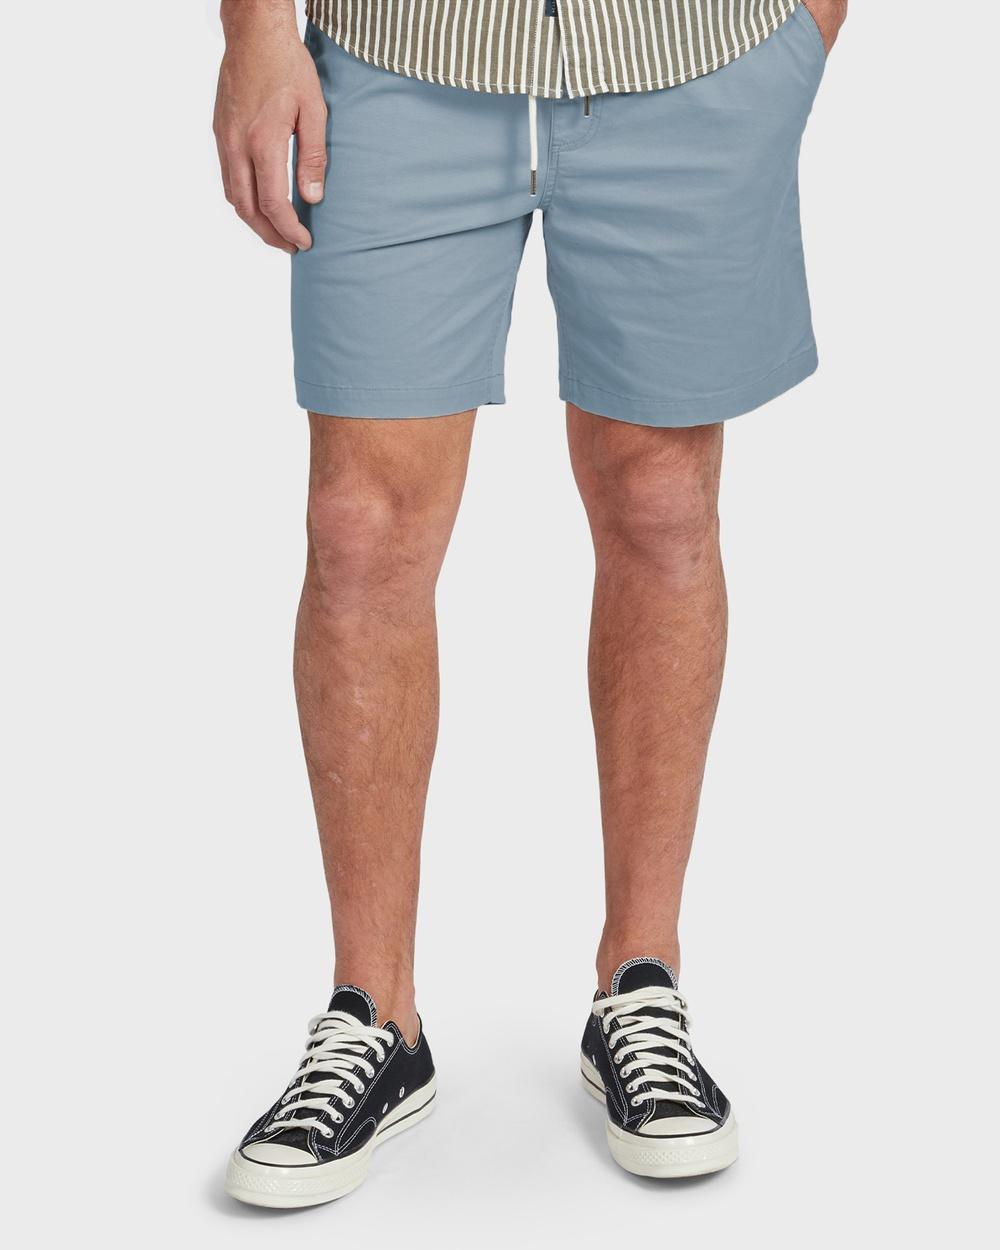 Academy Brand Volley Short Shorts Blue